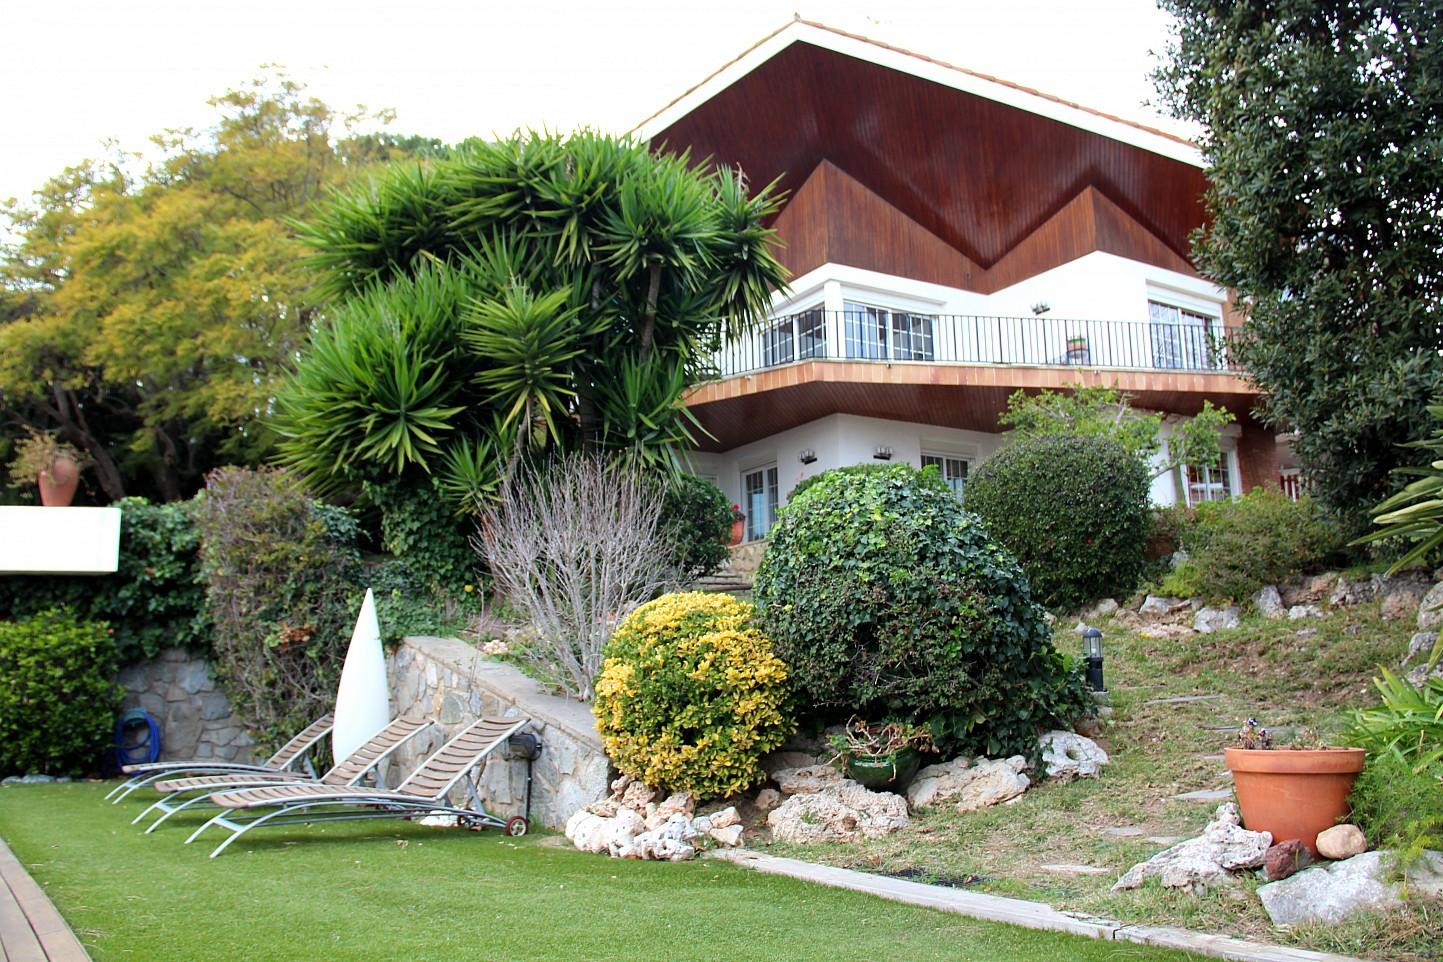 House for sale in el masnou oi realtor - Casas con piscina ...